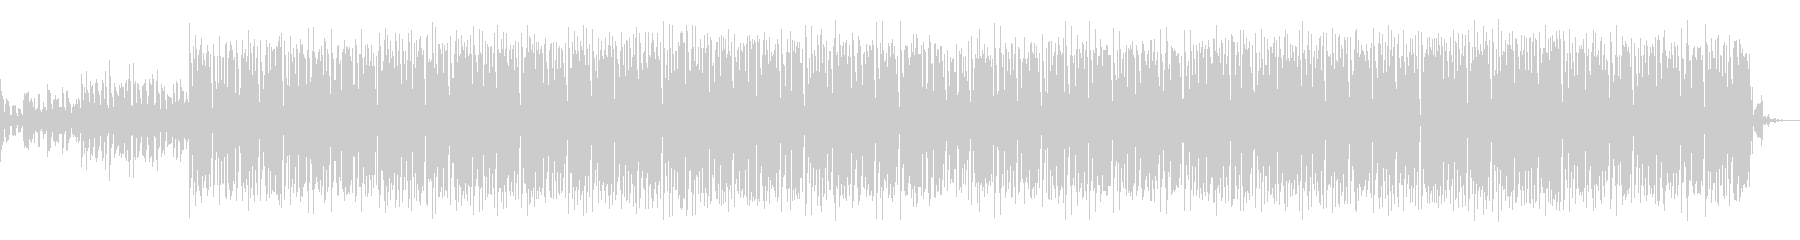 House track 01の未再生の波形